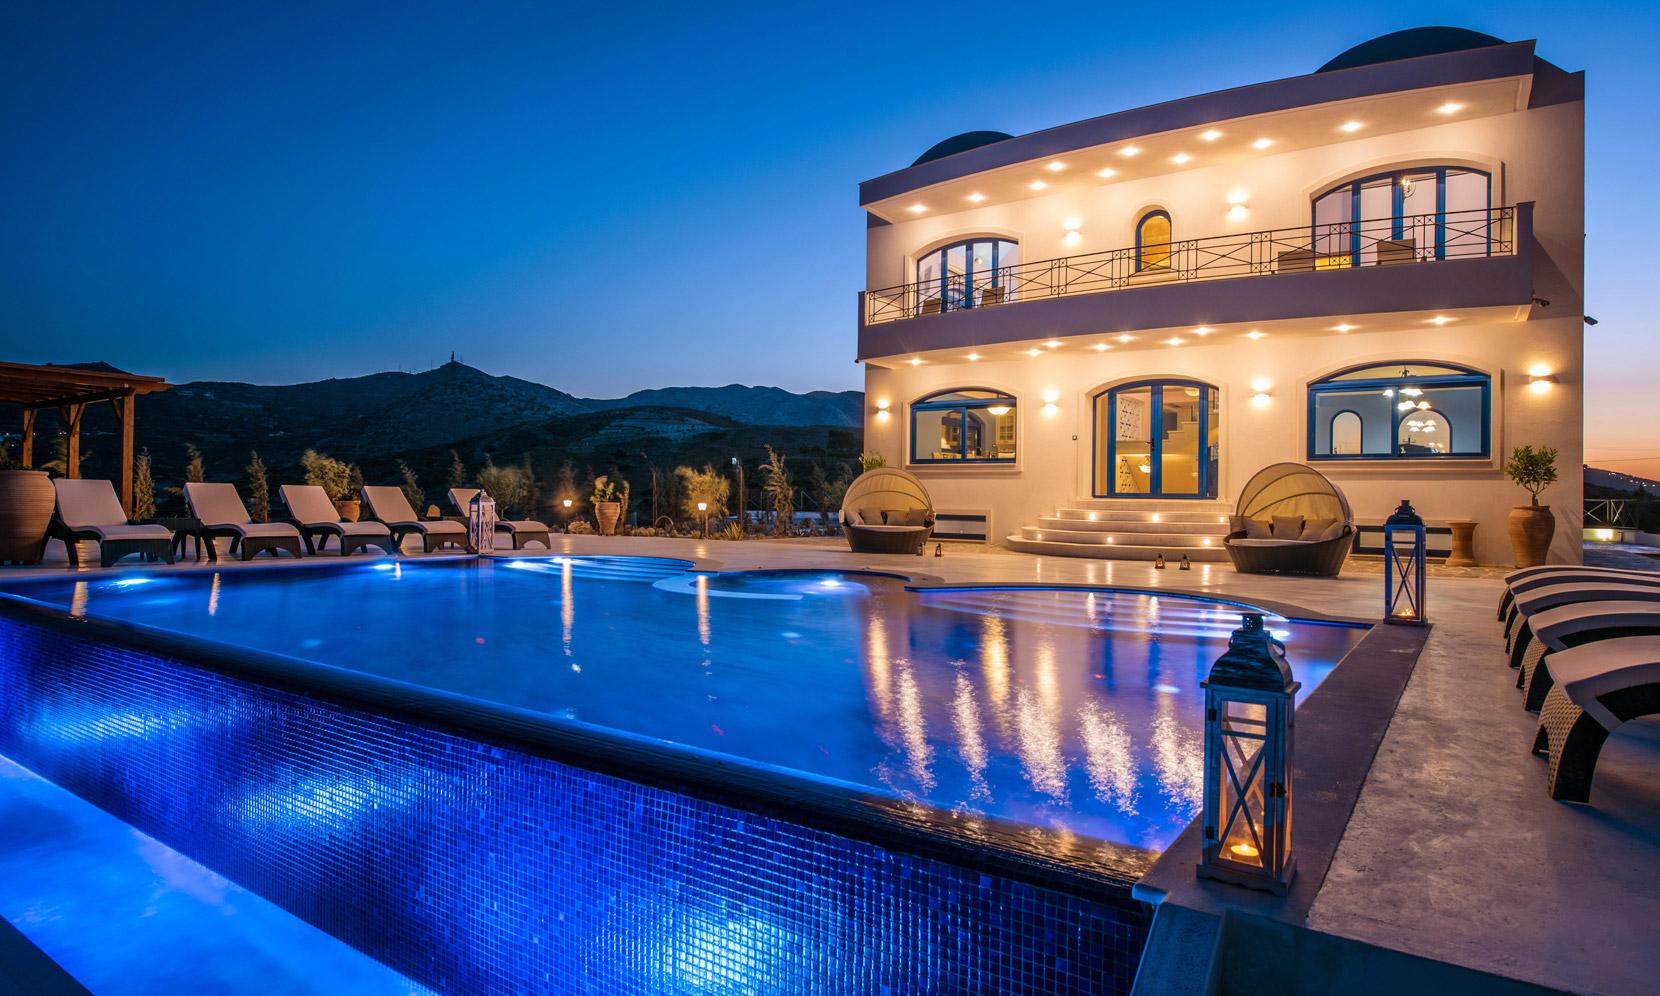 Crete Villa Pauline jumbotron image